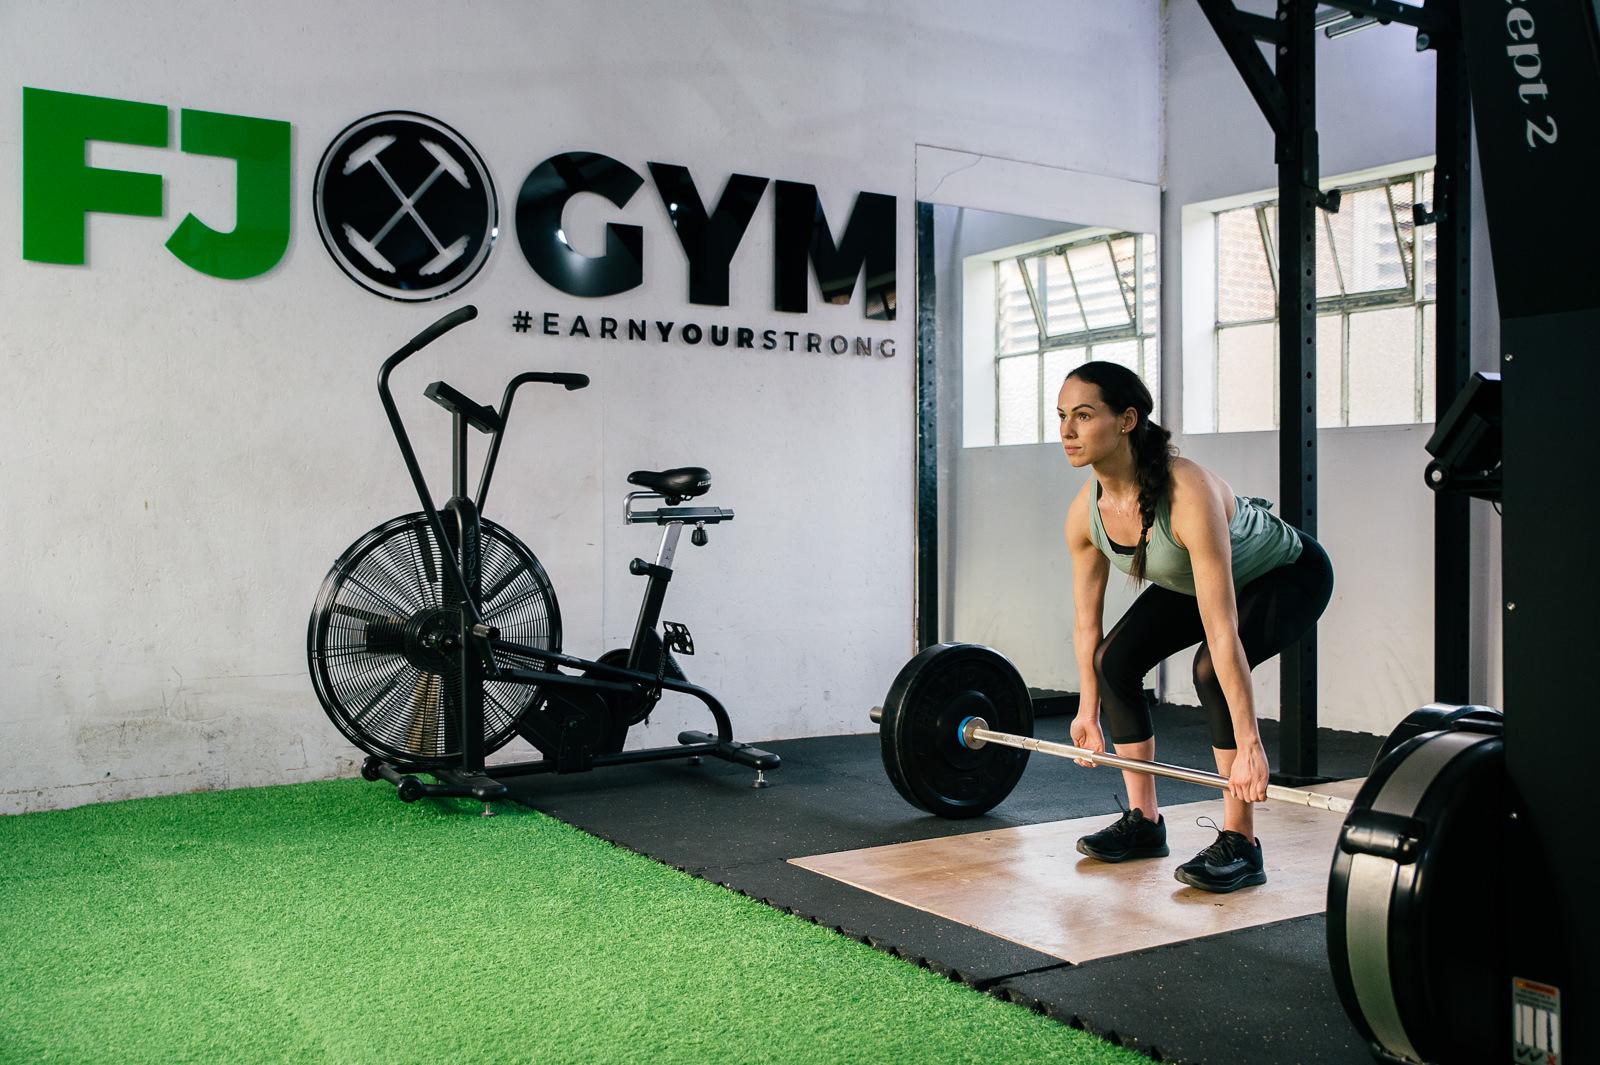 gym exercise deadlift